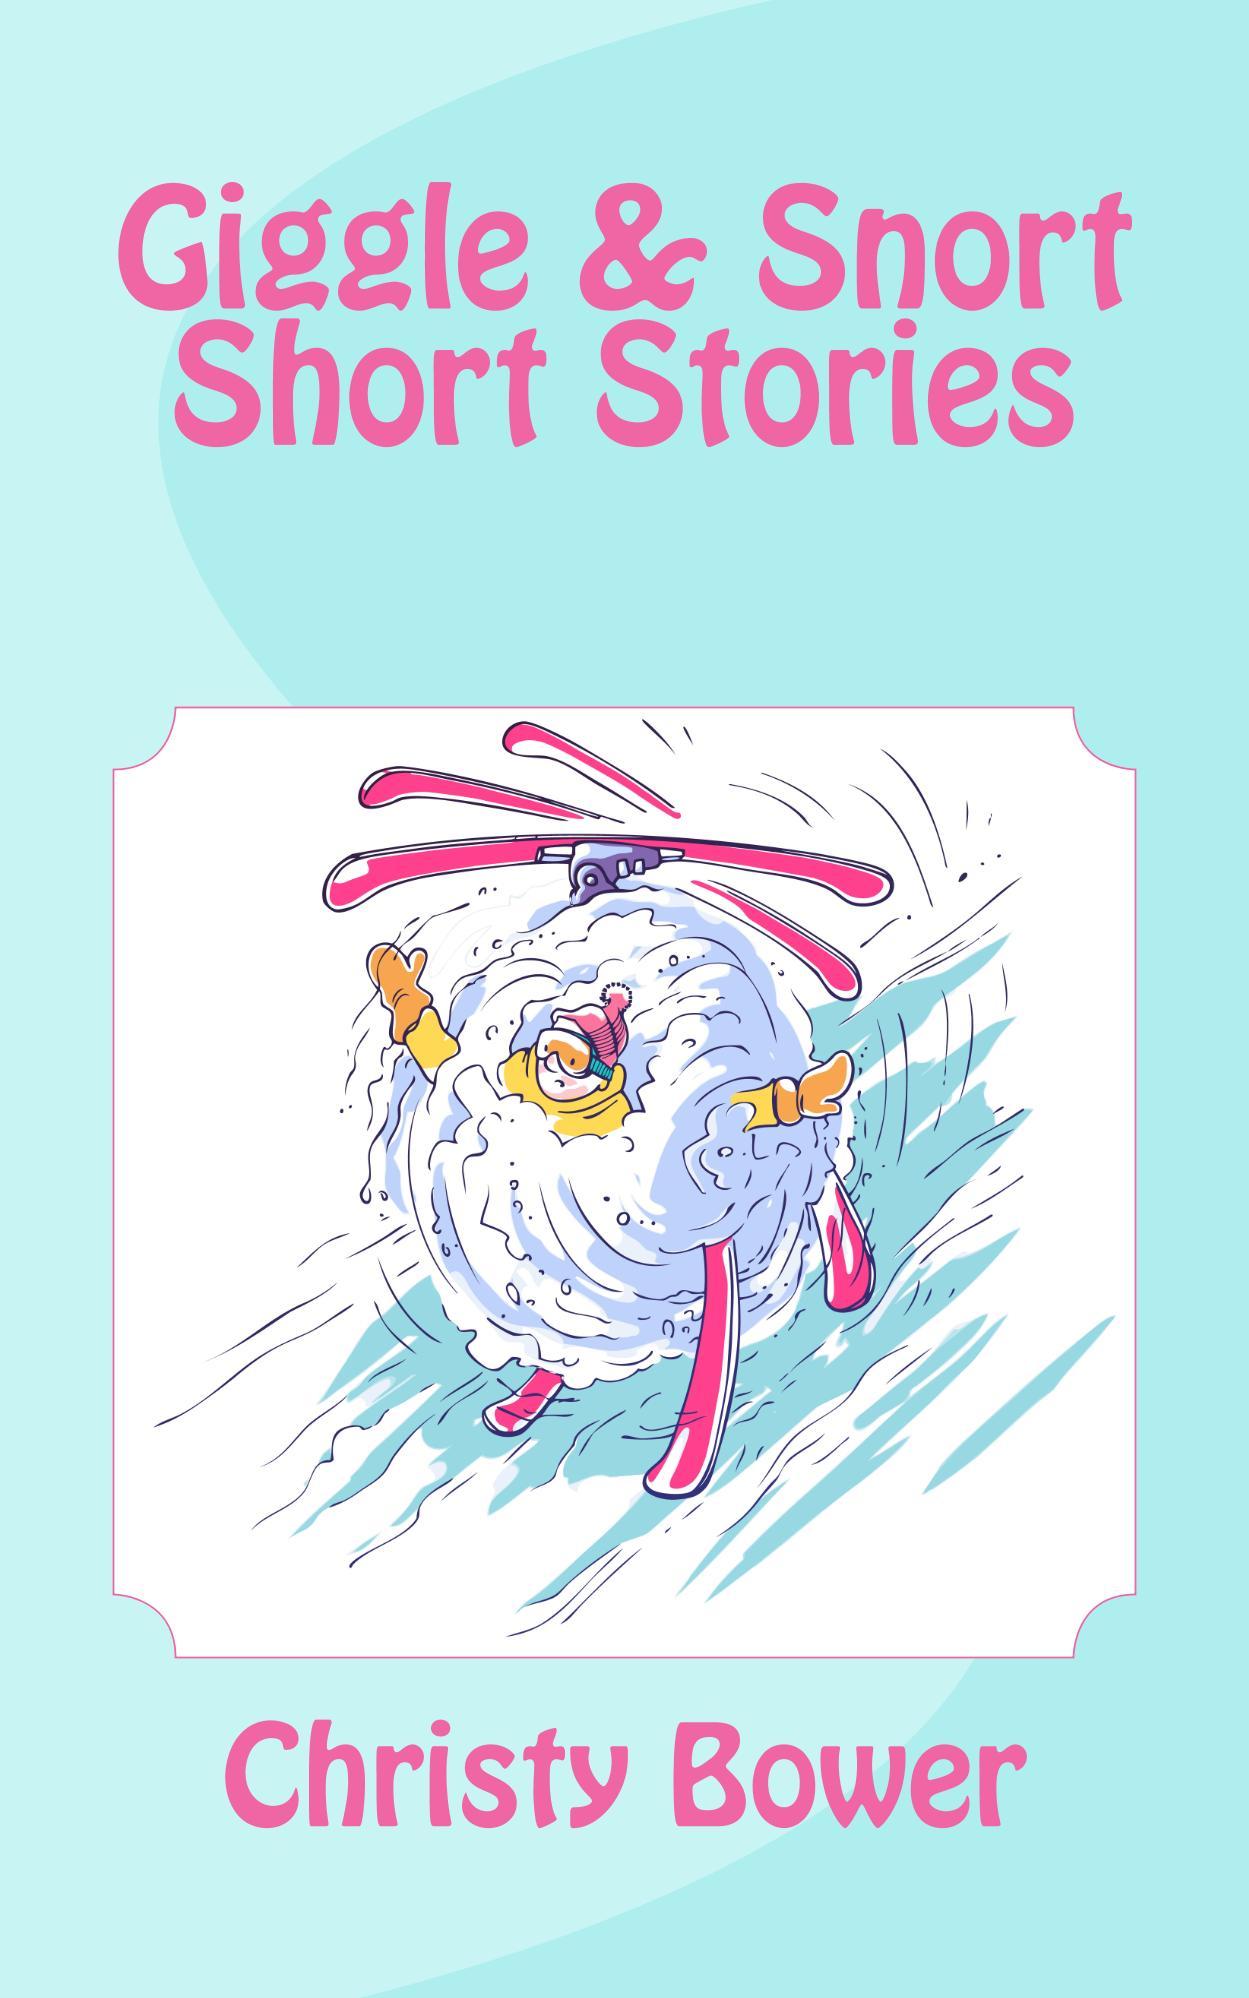 Giggle & Snort Short Stories